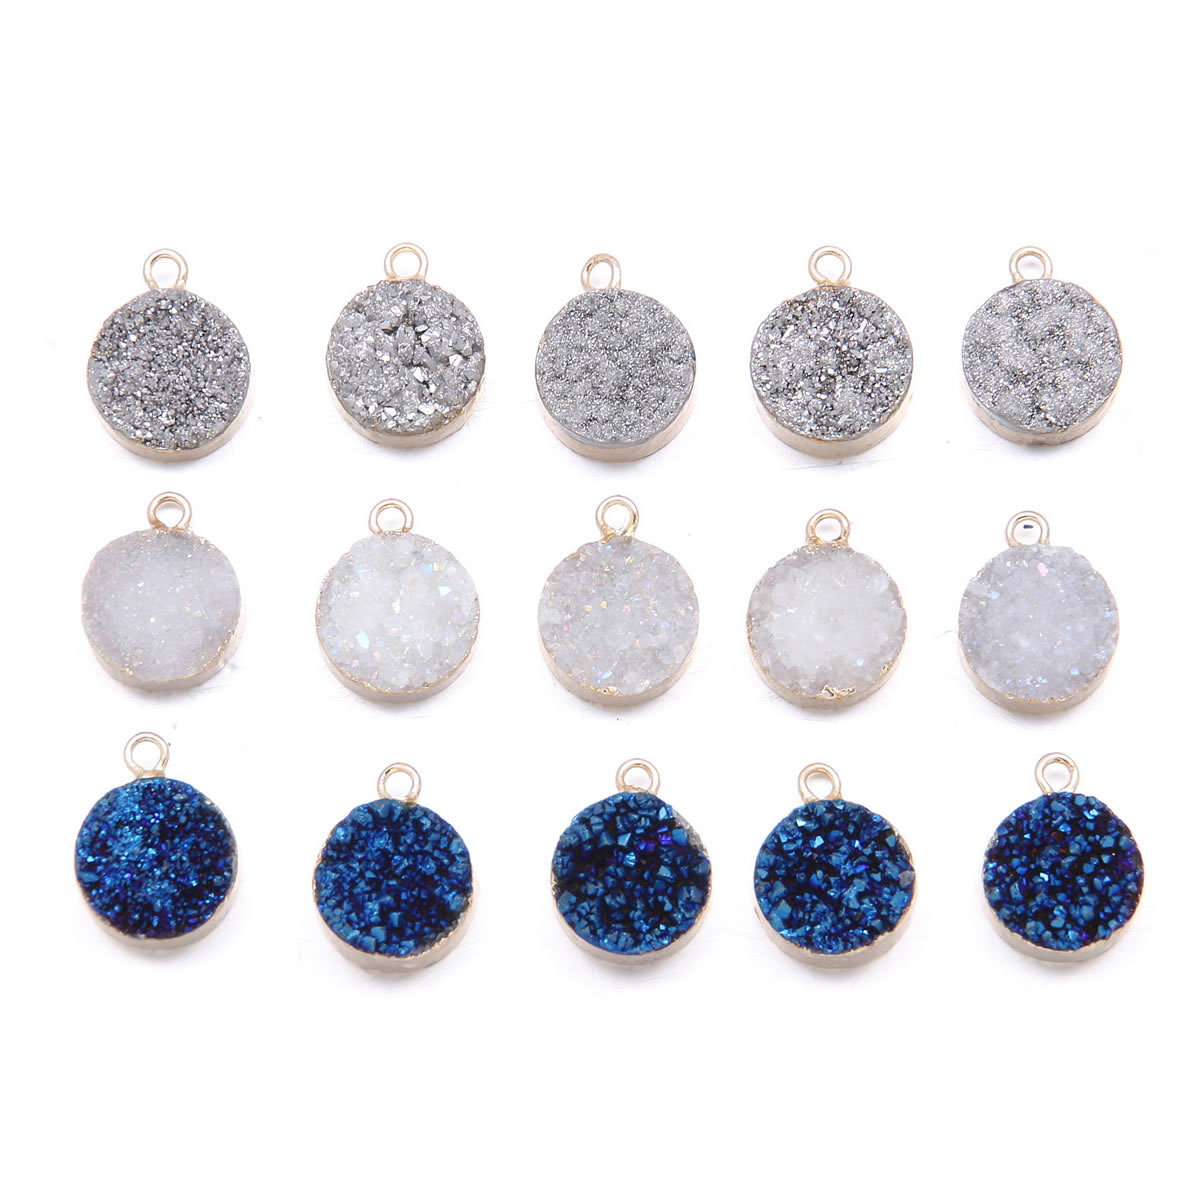 Piedra Natural brasileña rebanada gris azul y blanco ágata colgante para collar mujeres fabricación de joyas